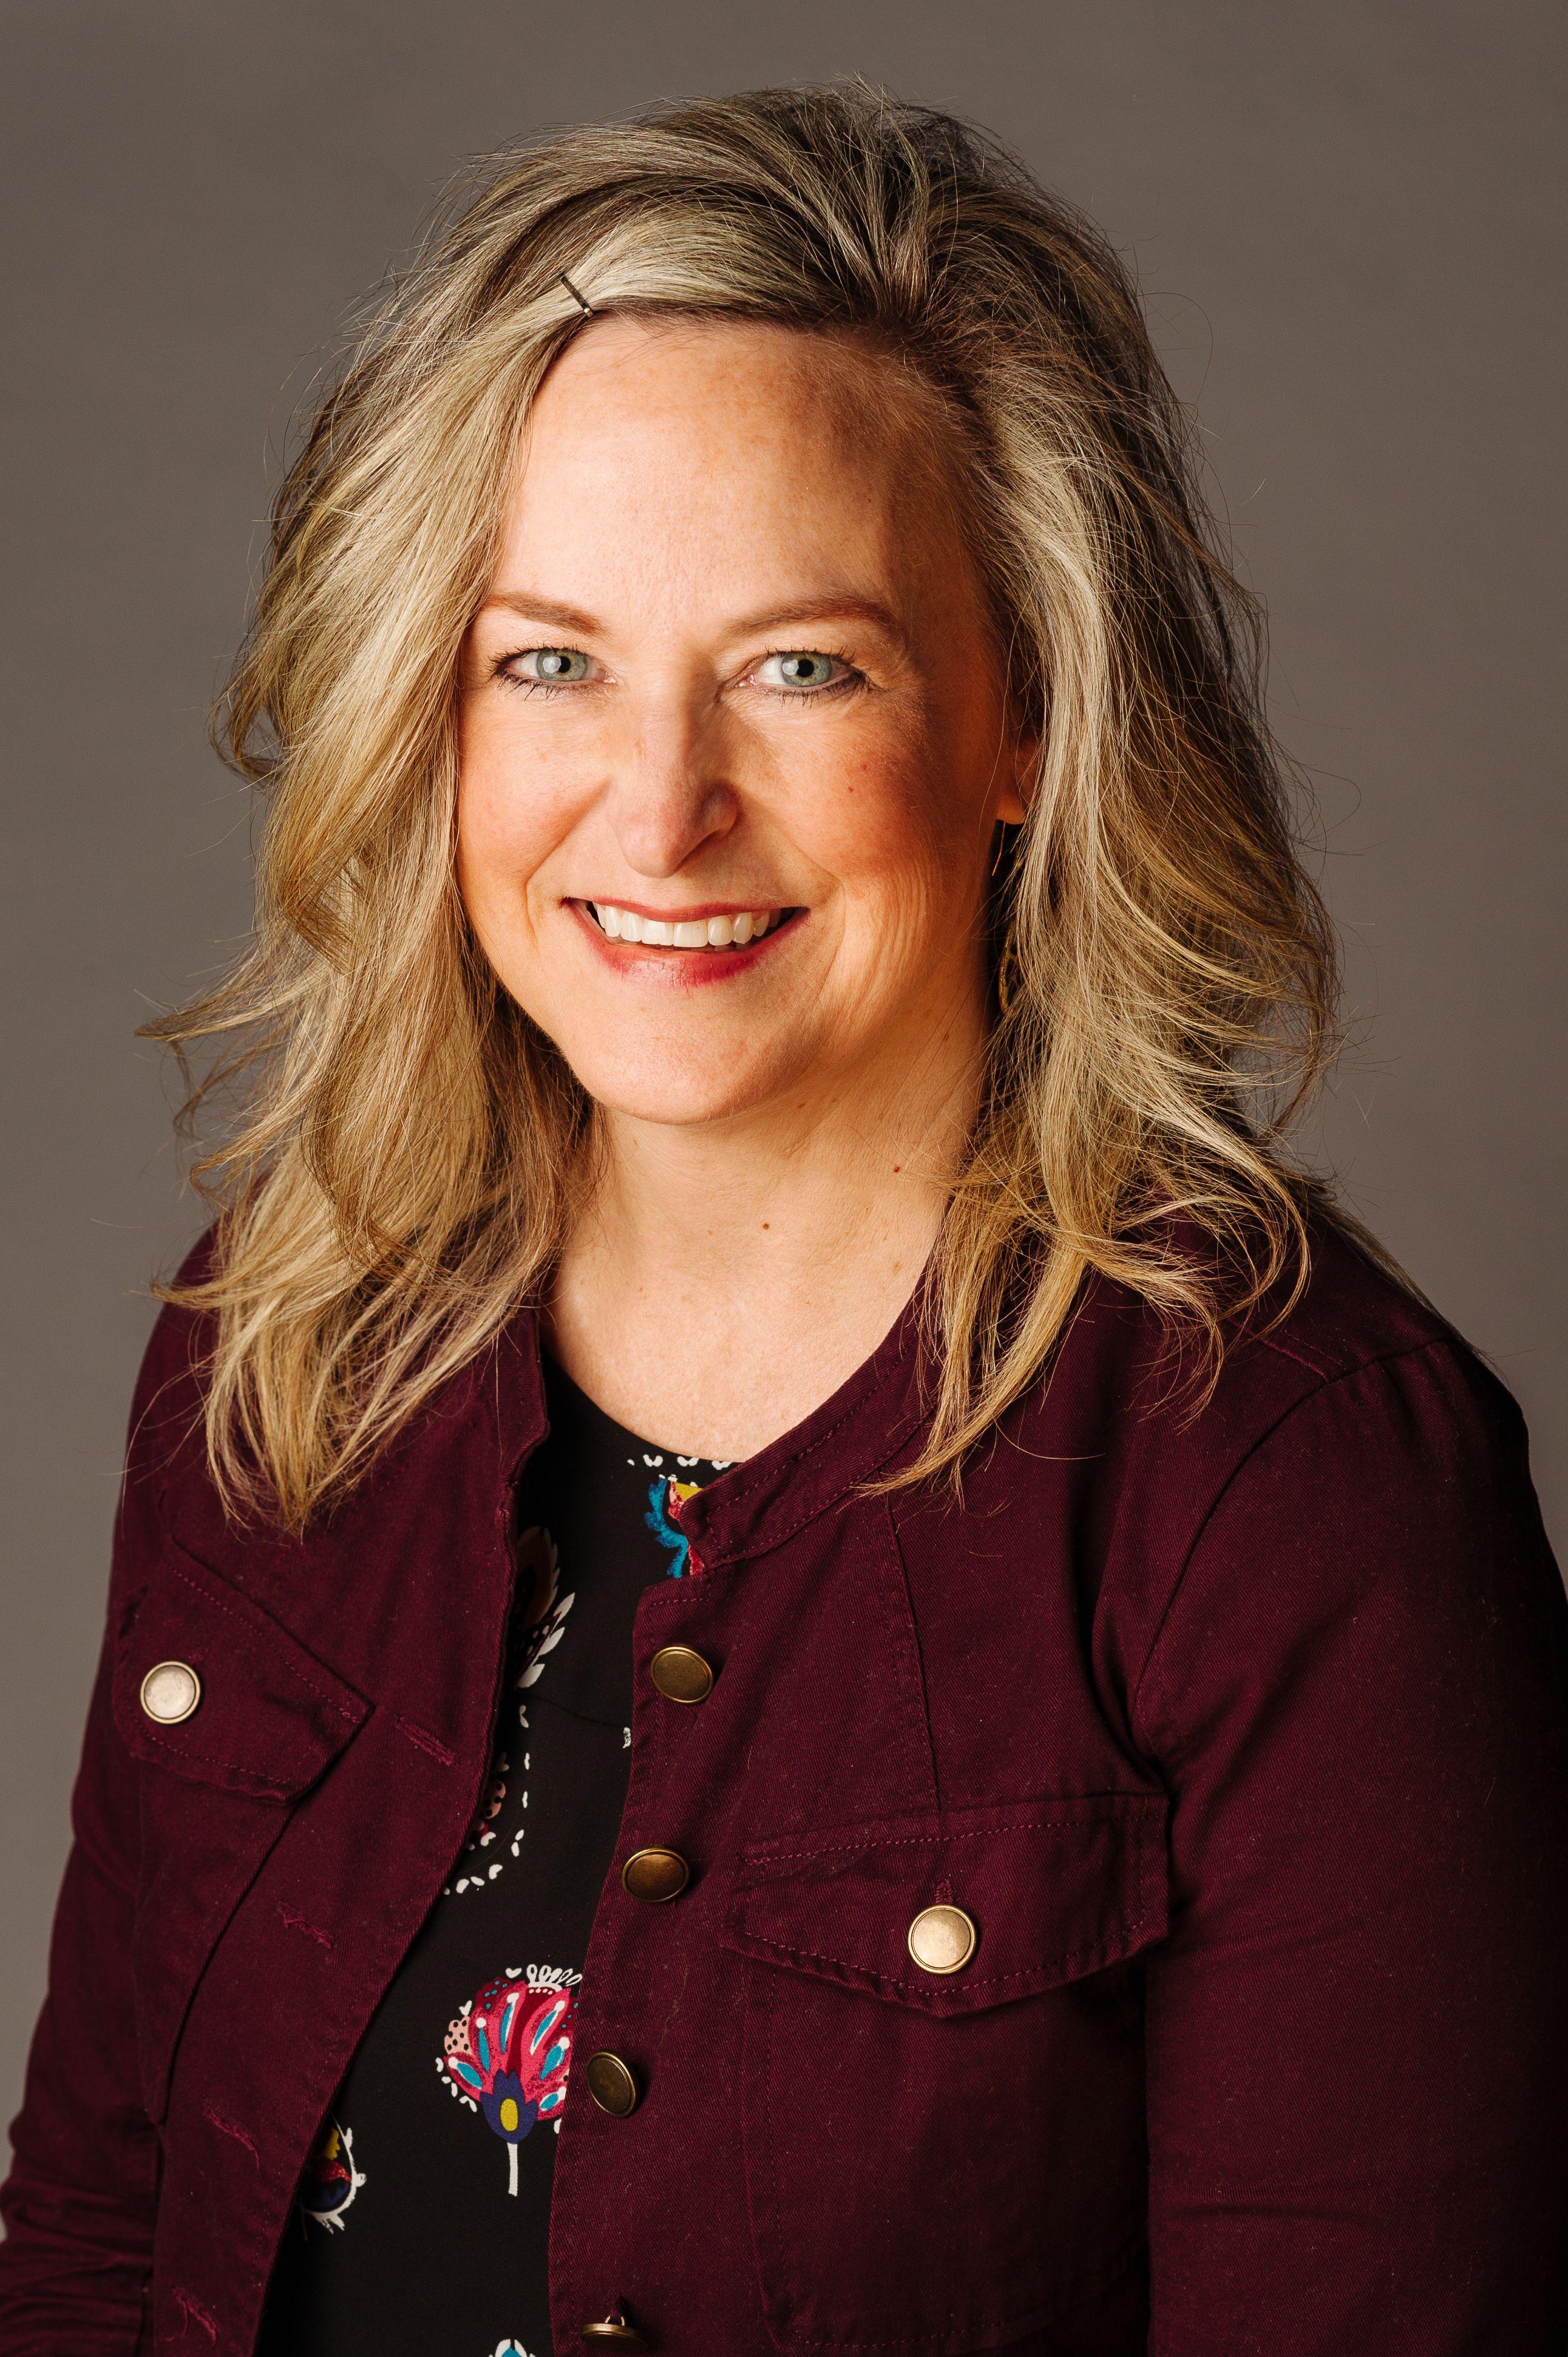 Kelley Deases - Grant Writer